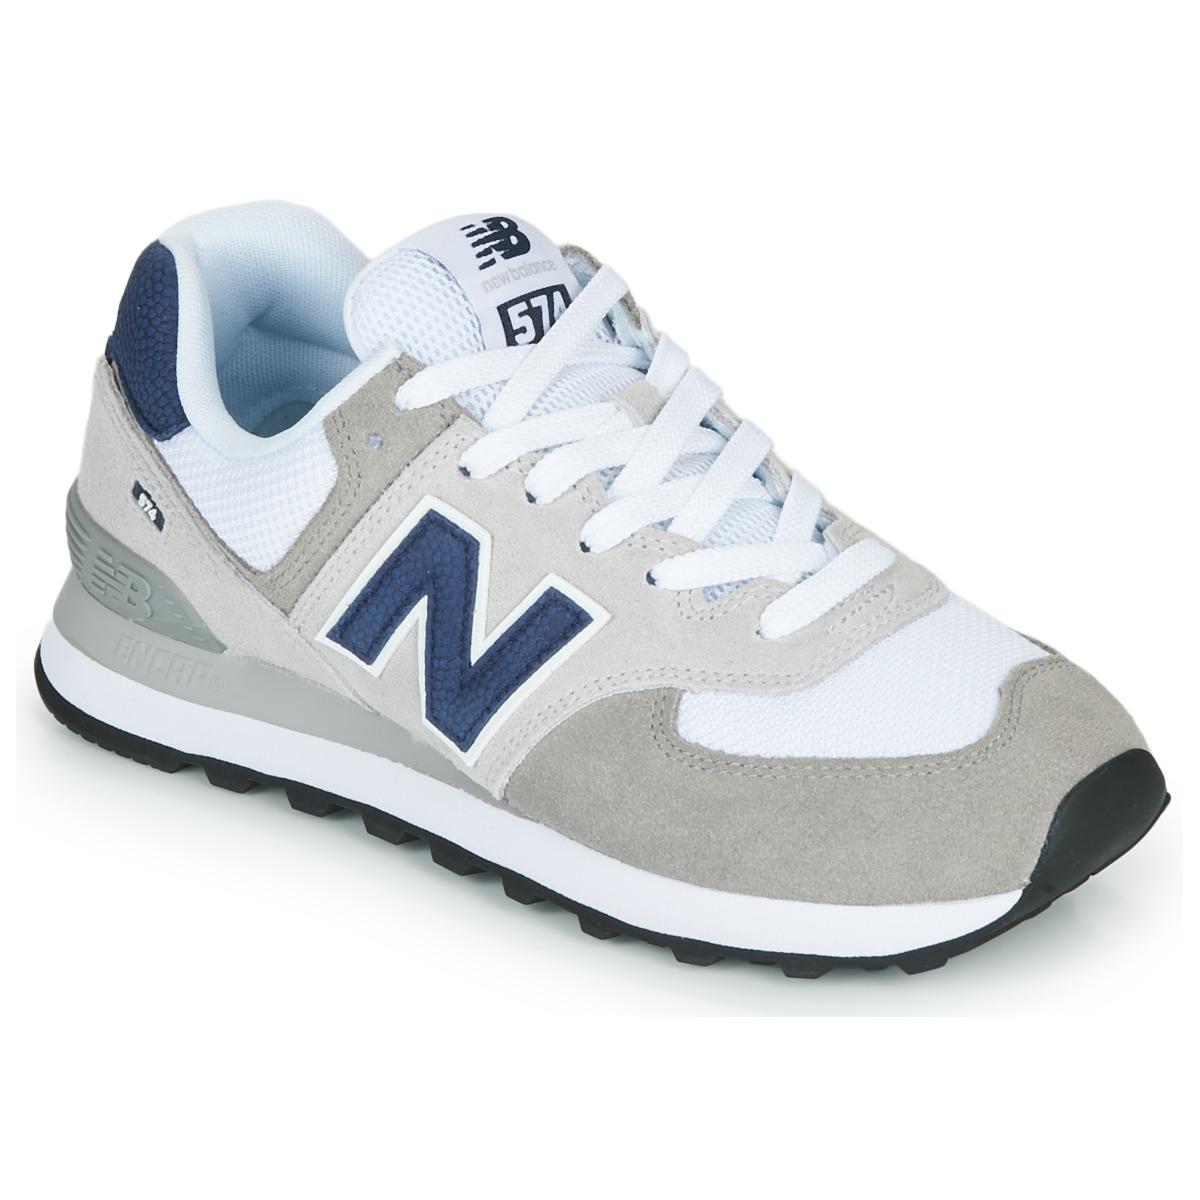 Men's Shoes New Balance 574 Classic Scarpe Sportive Sneakers Uomo ...